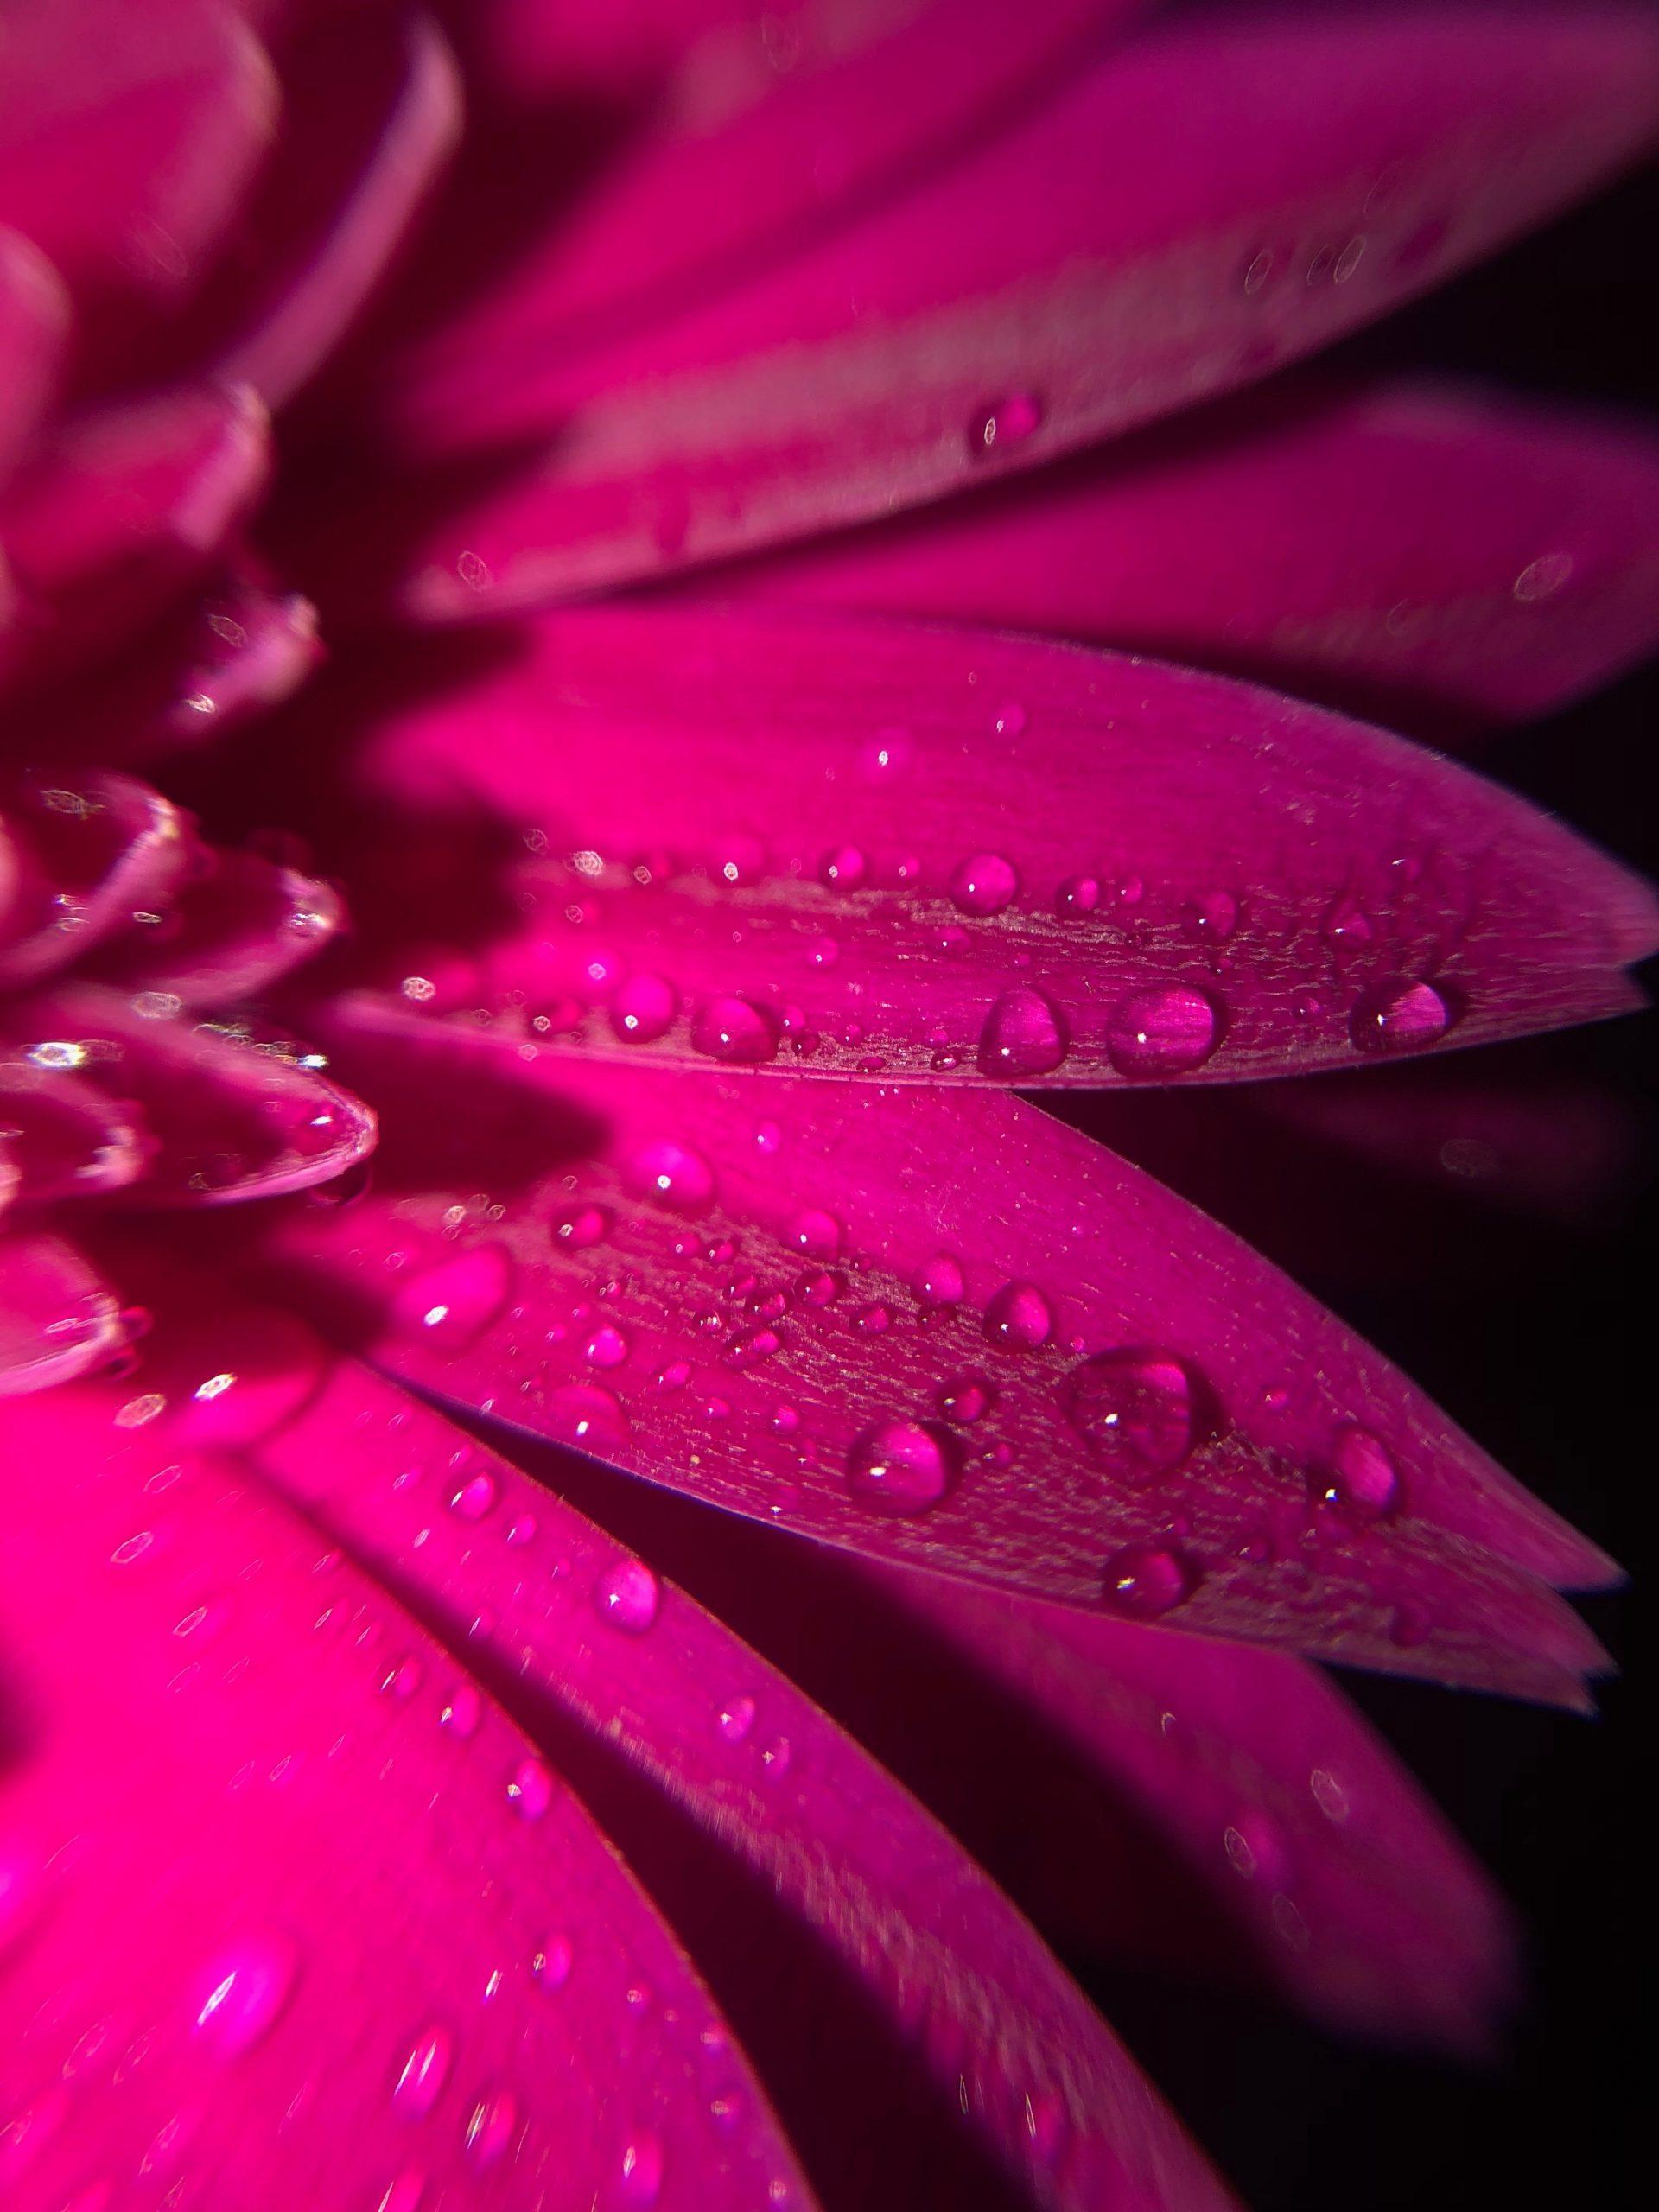 Dew drops on a flower